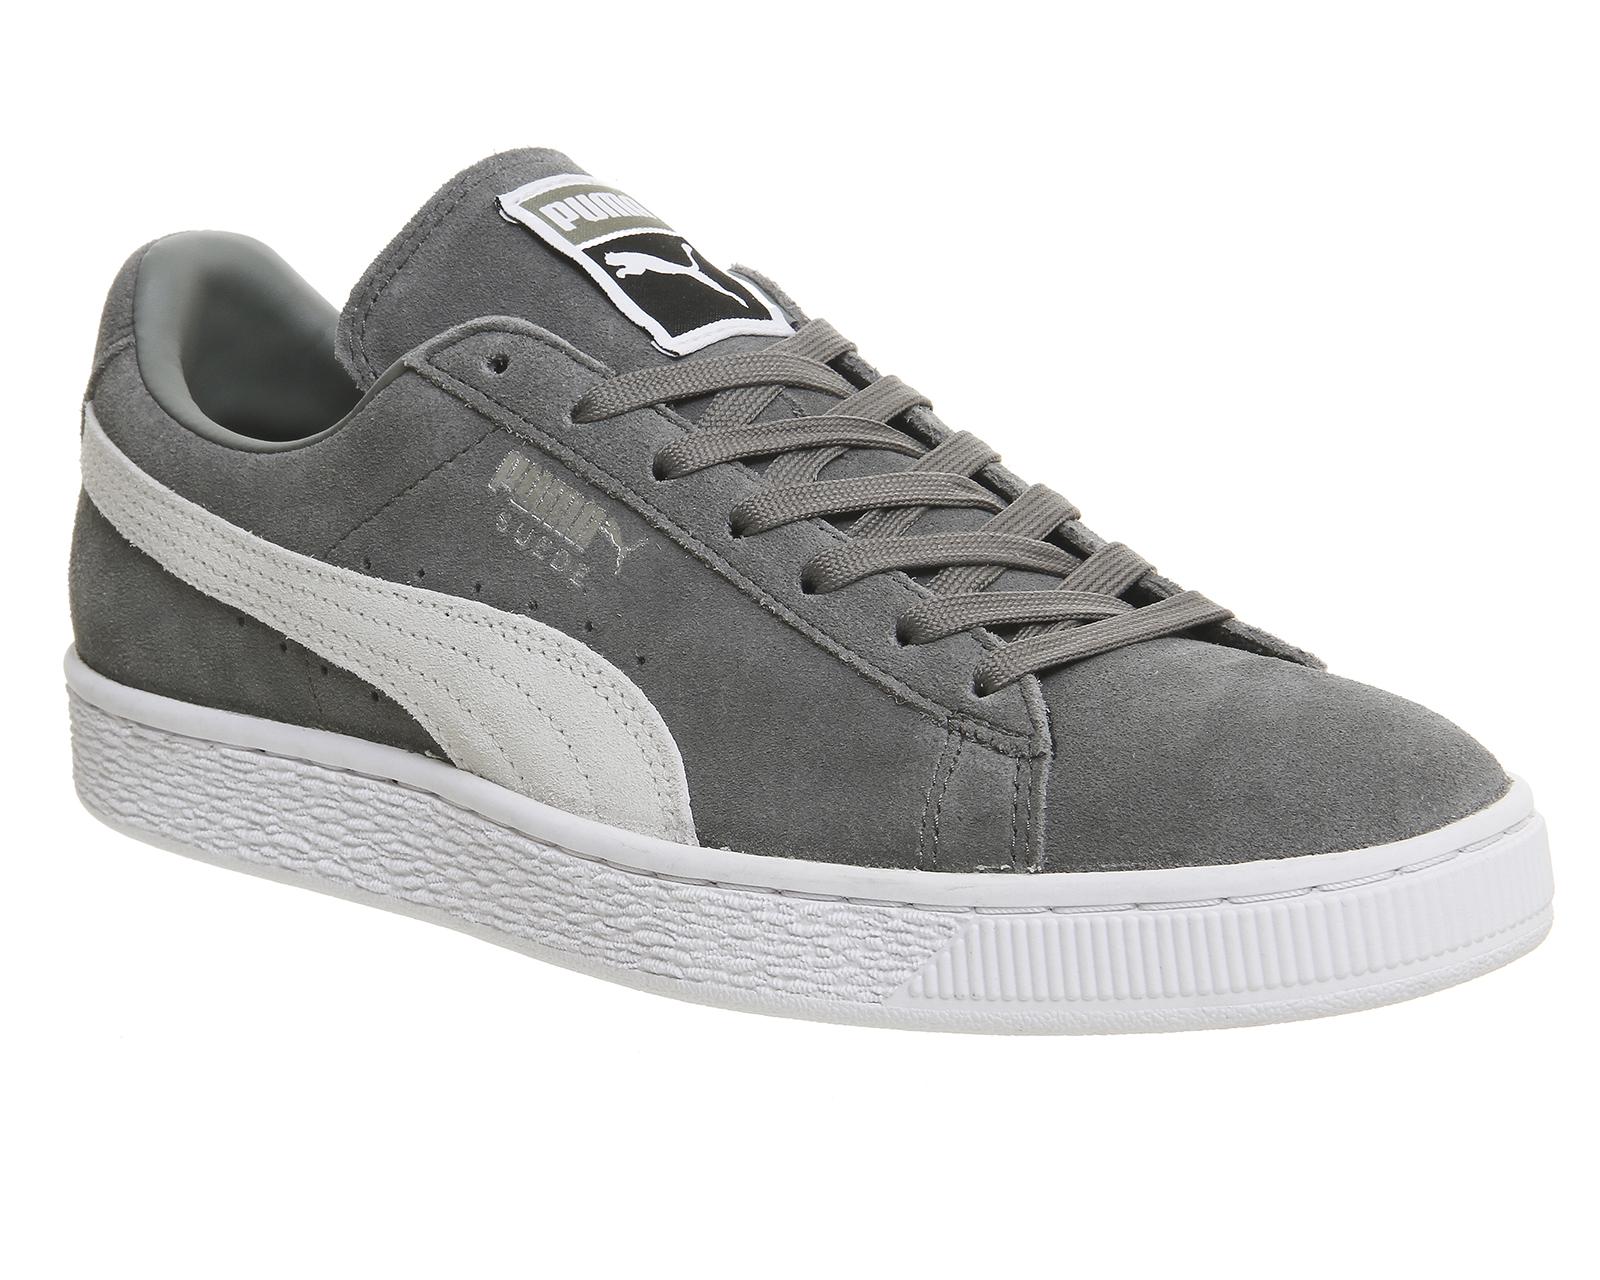 puma suede classic grey white Sale,up